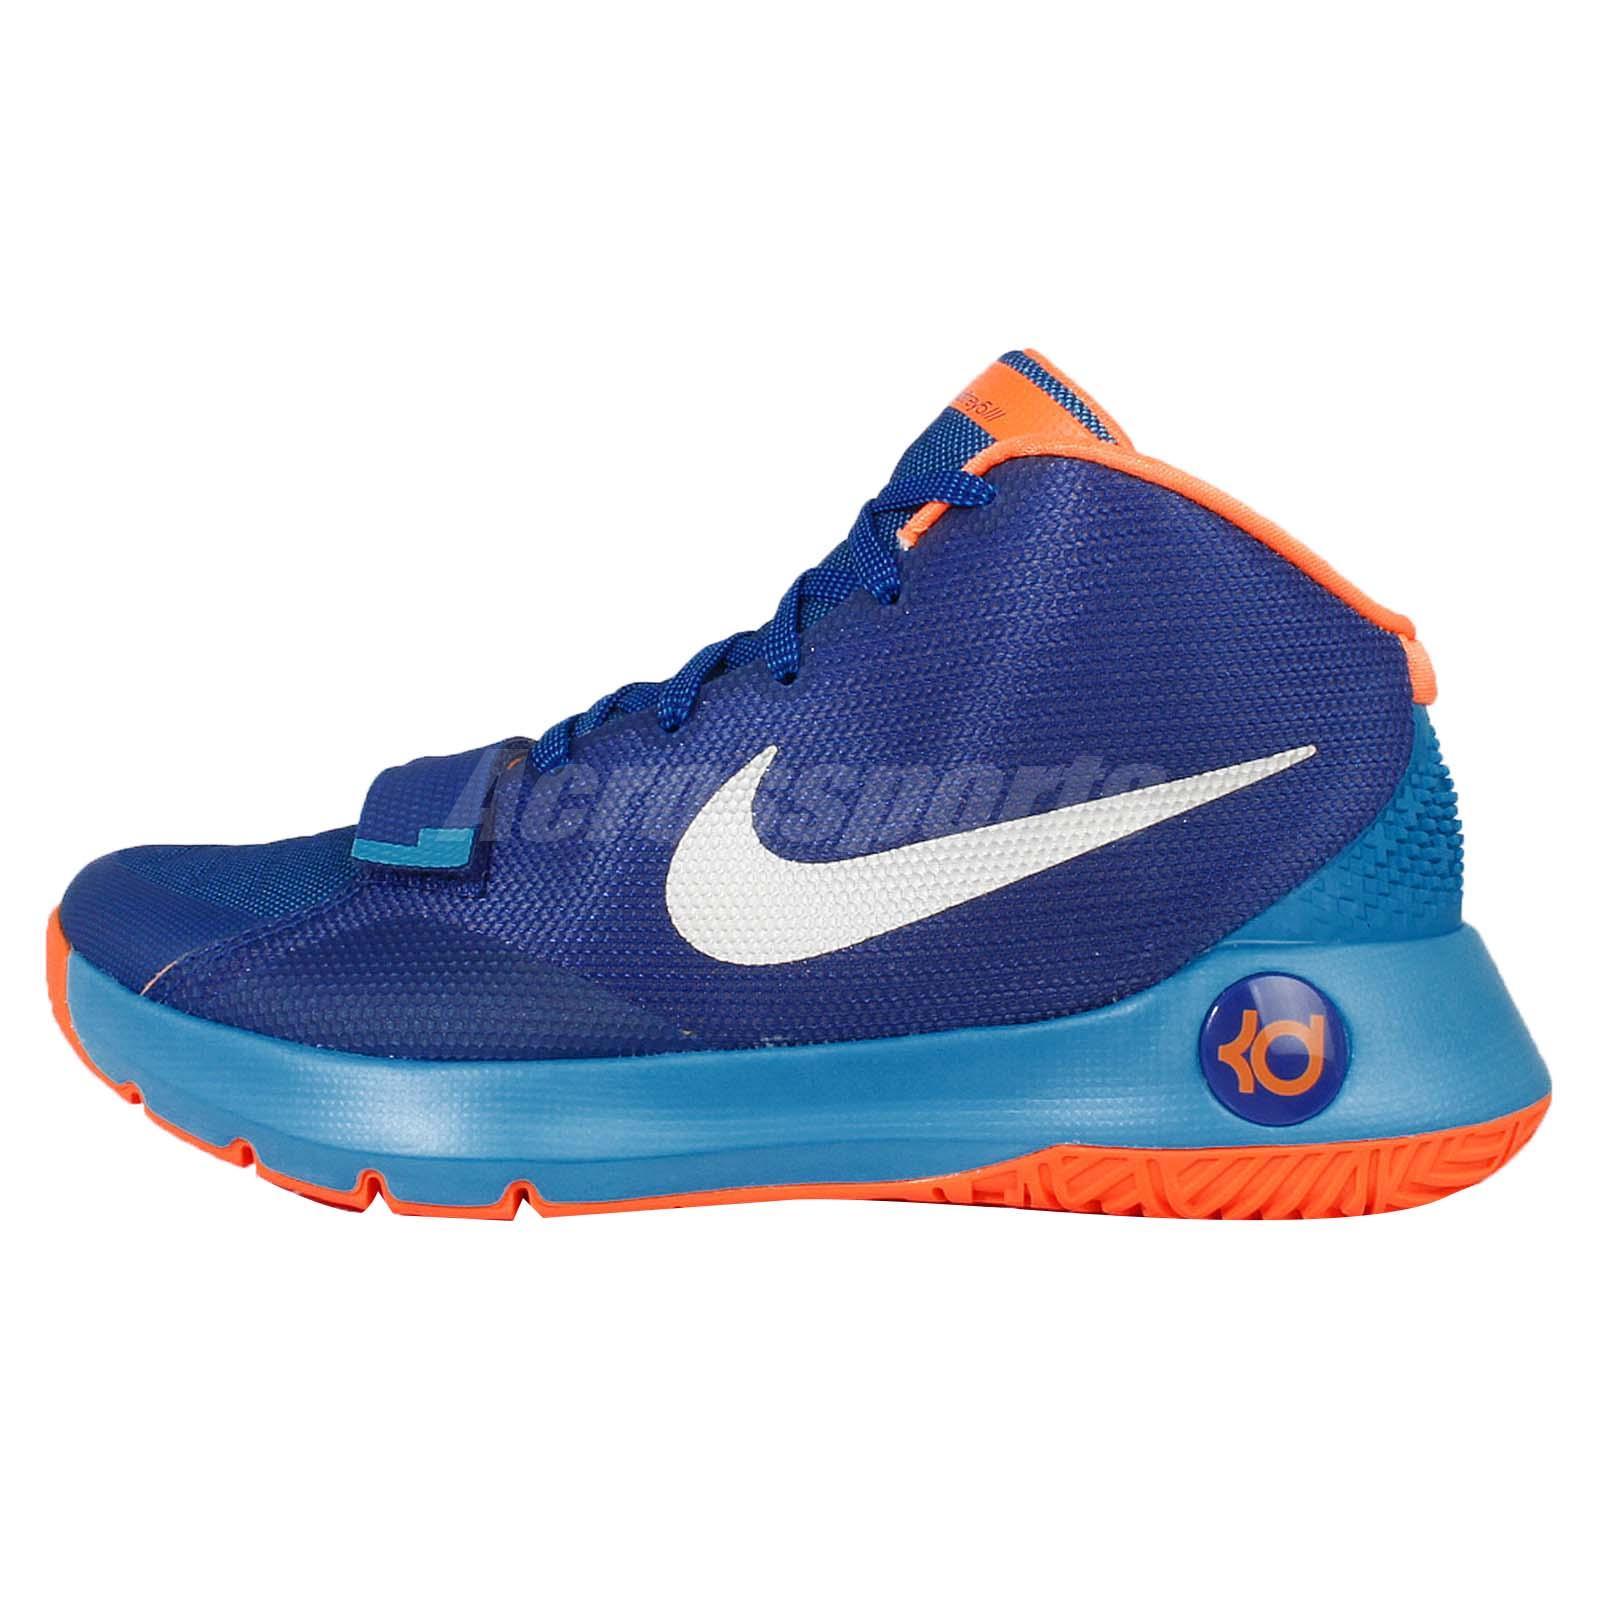 nike kd trey 5 orange blue